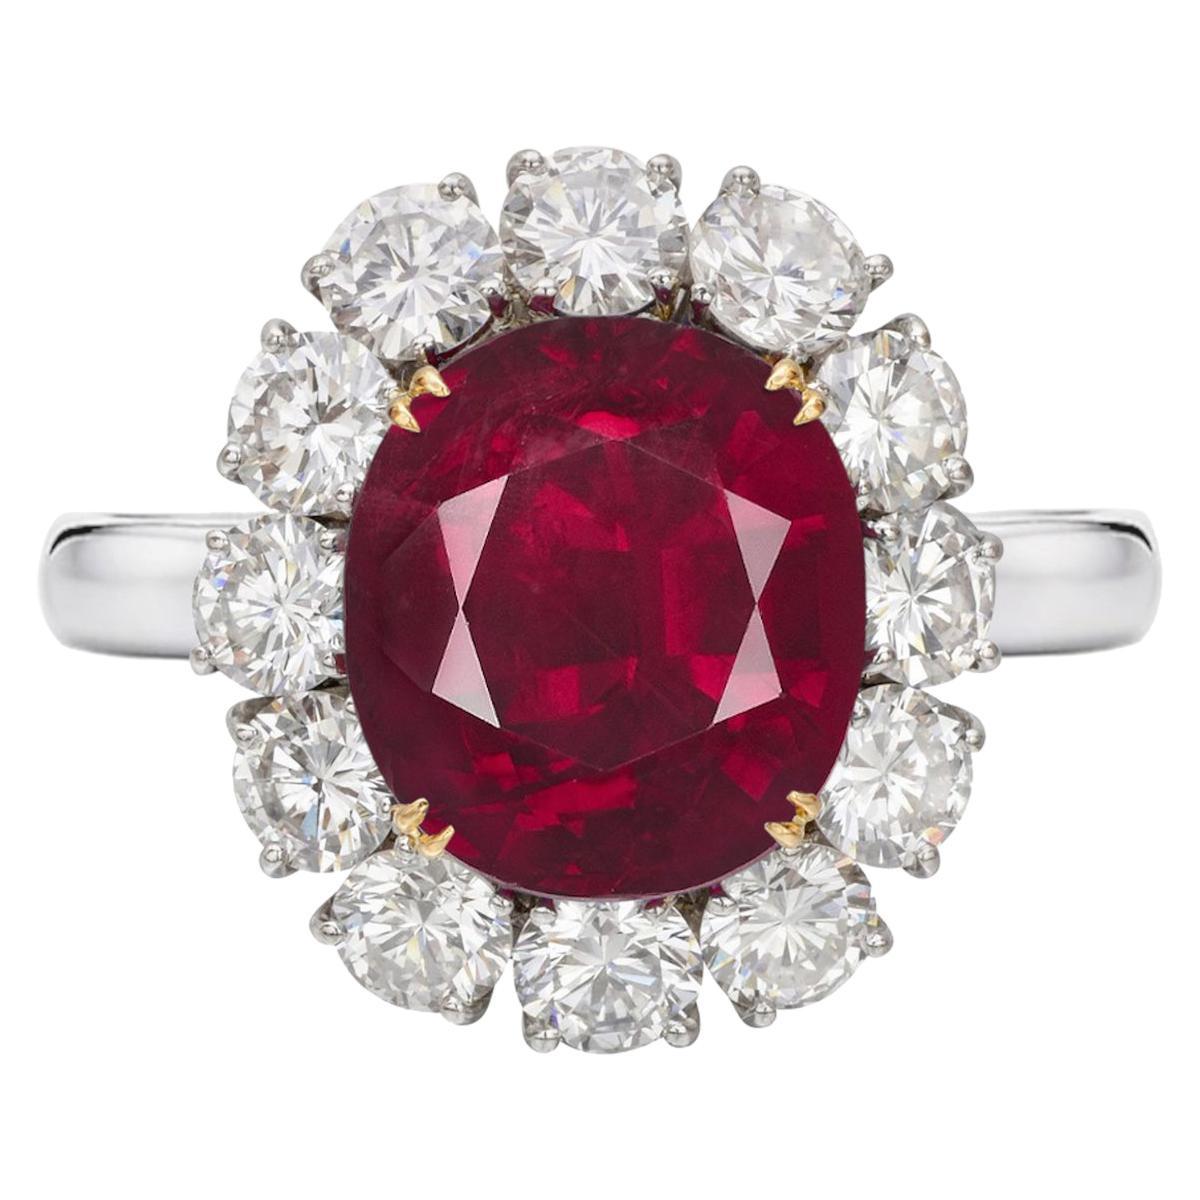 GRS Switzerland 6 Carat Vivid Peagon's Blood Purple Red Oval Ruby Diamond Ring